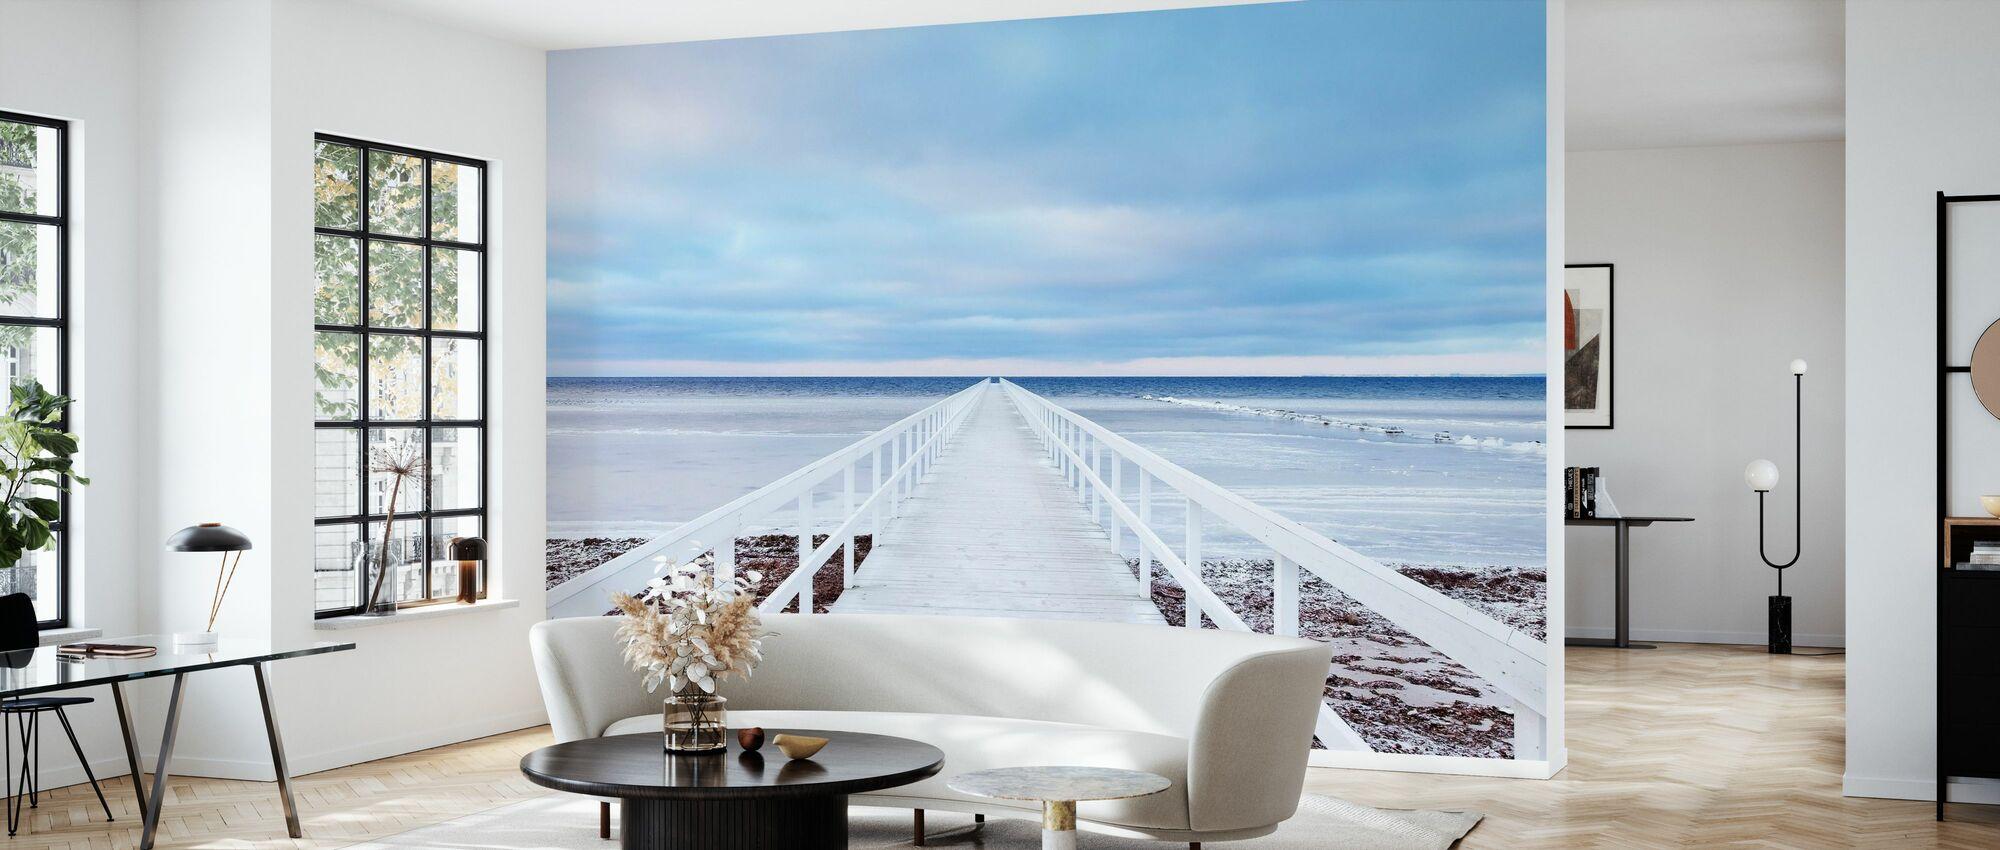 Bridge - Wallpaper - Living Room